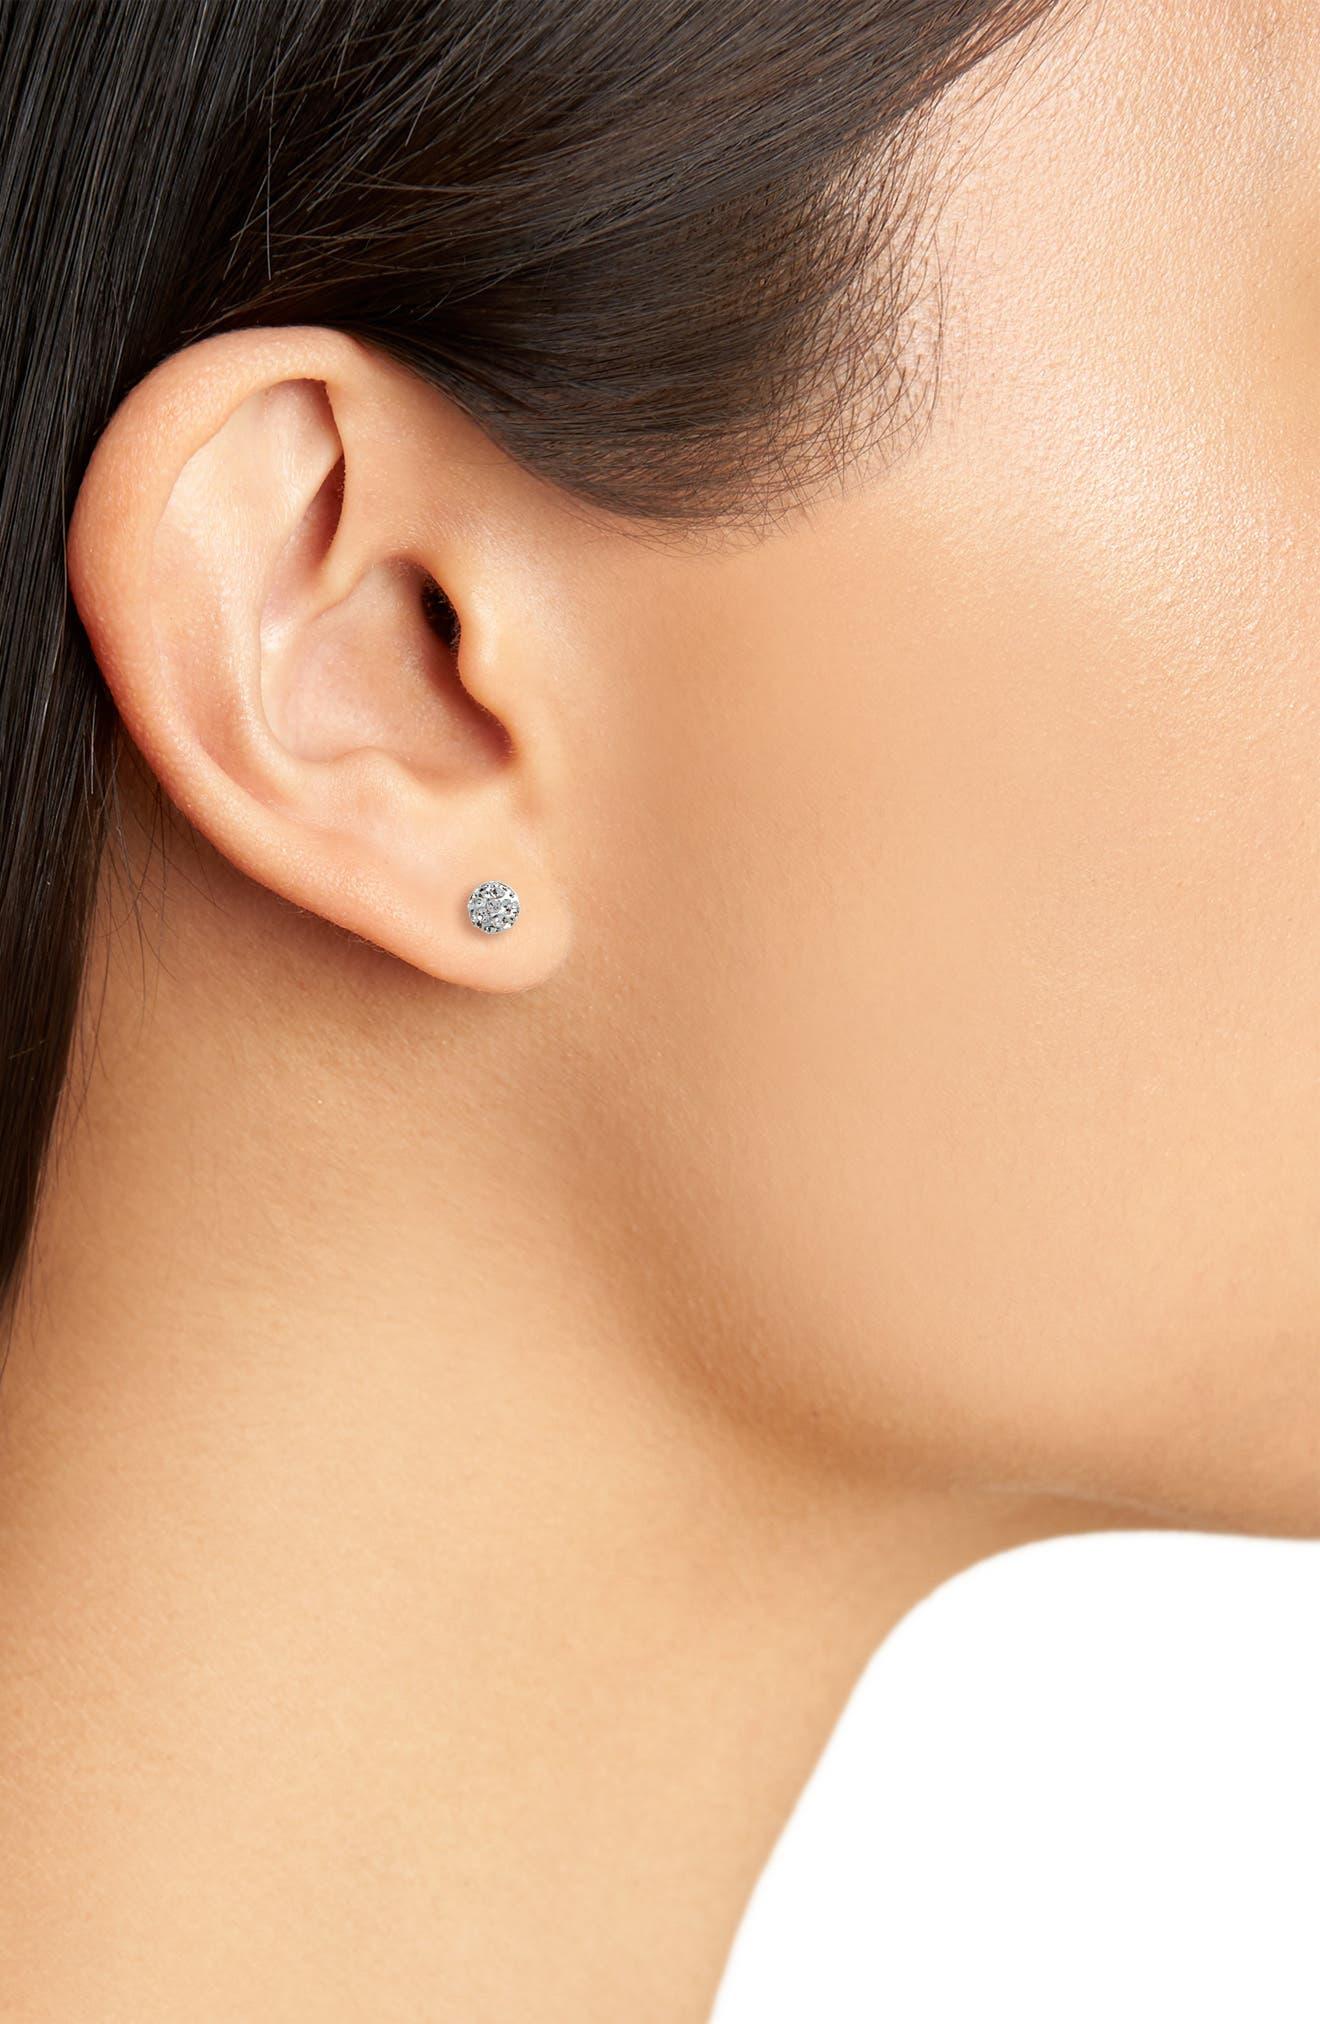 Crystal & Sterling Silver Stud Earrings,                             Alternate thumbnail 3, color,